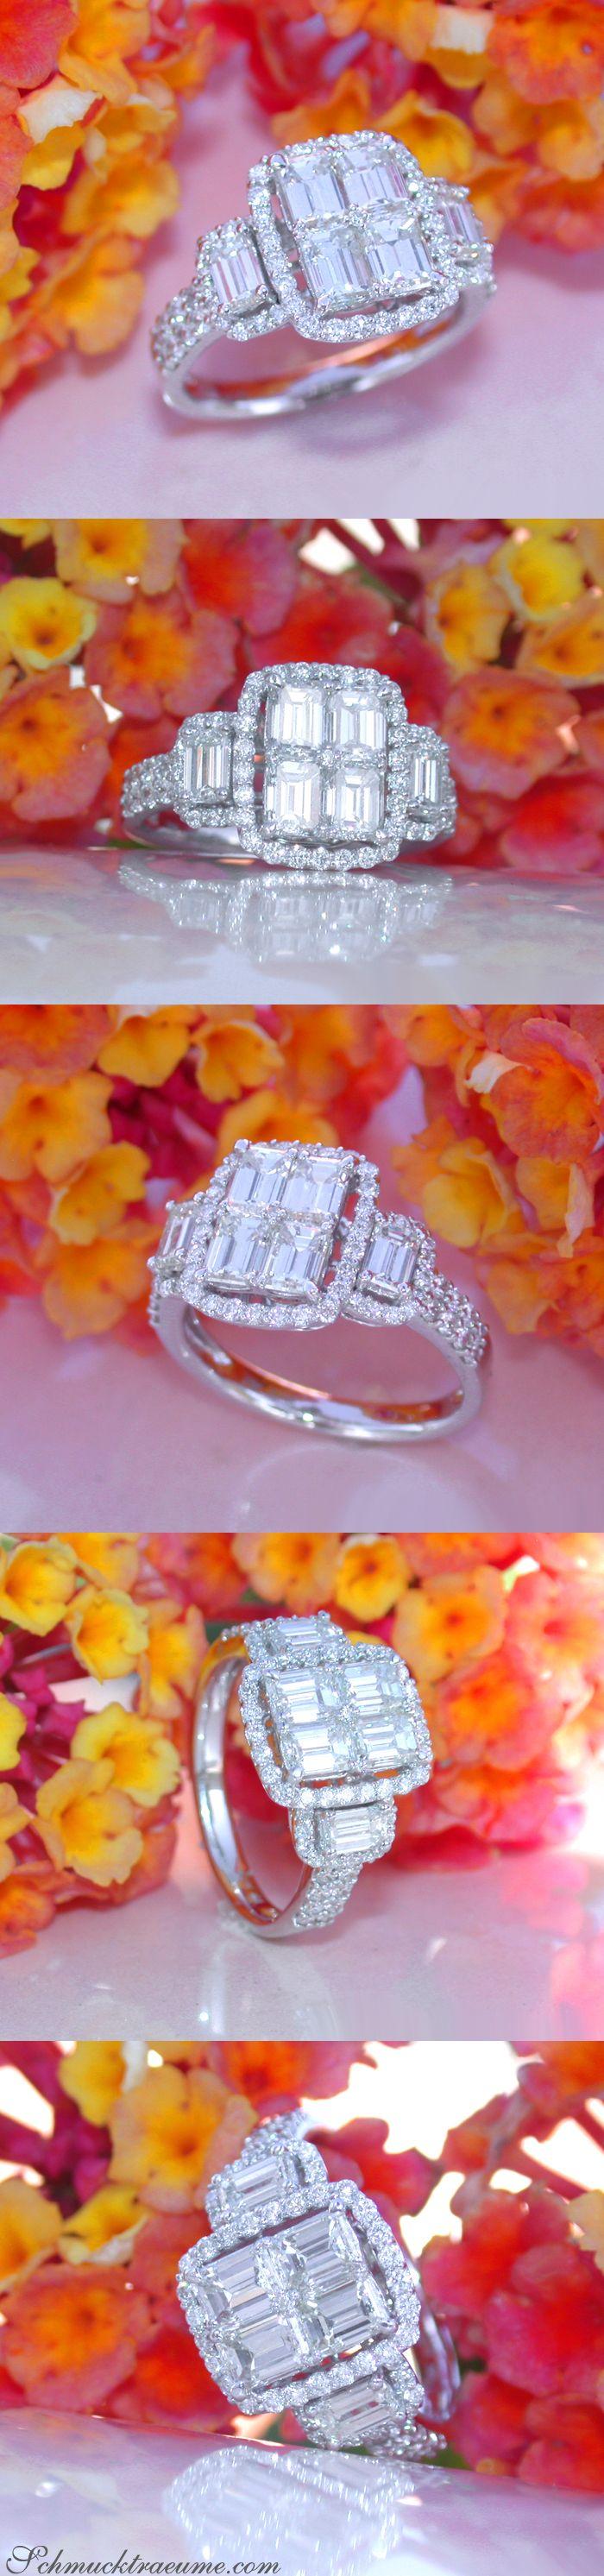 High-end Emerald Cut Diamond Ring   Luxuriöser Brillant Ring mit Diamanten im Smaragdschliff   2,29 ct. G VS/VVS   WG 18k   Visit: schmucktraeume.com   Like:https://www.facebook.com/Noble-Juwelen-150871984924926/